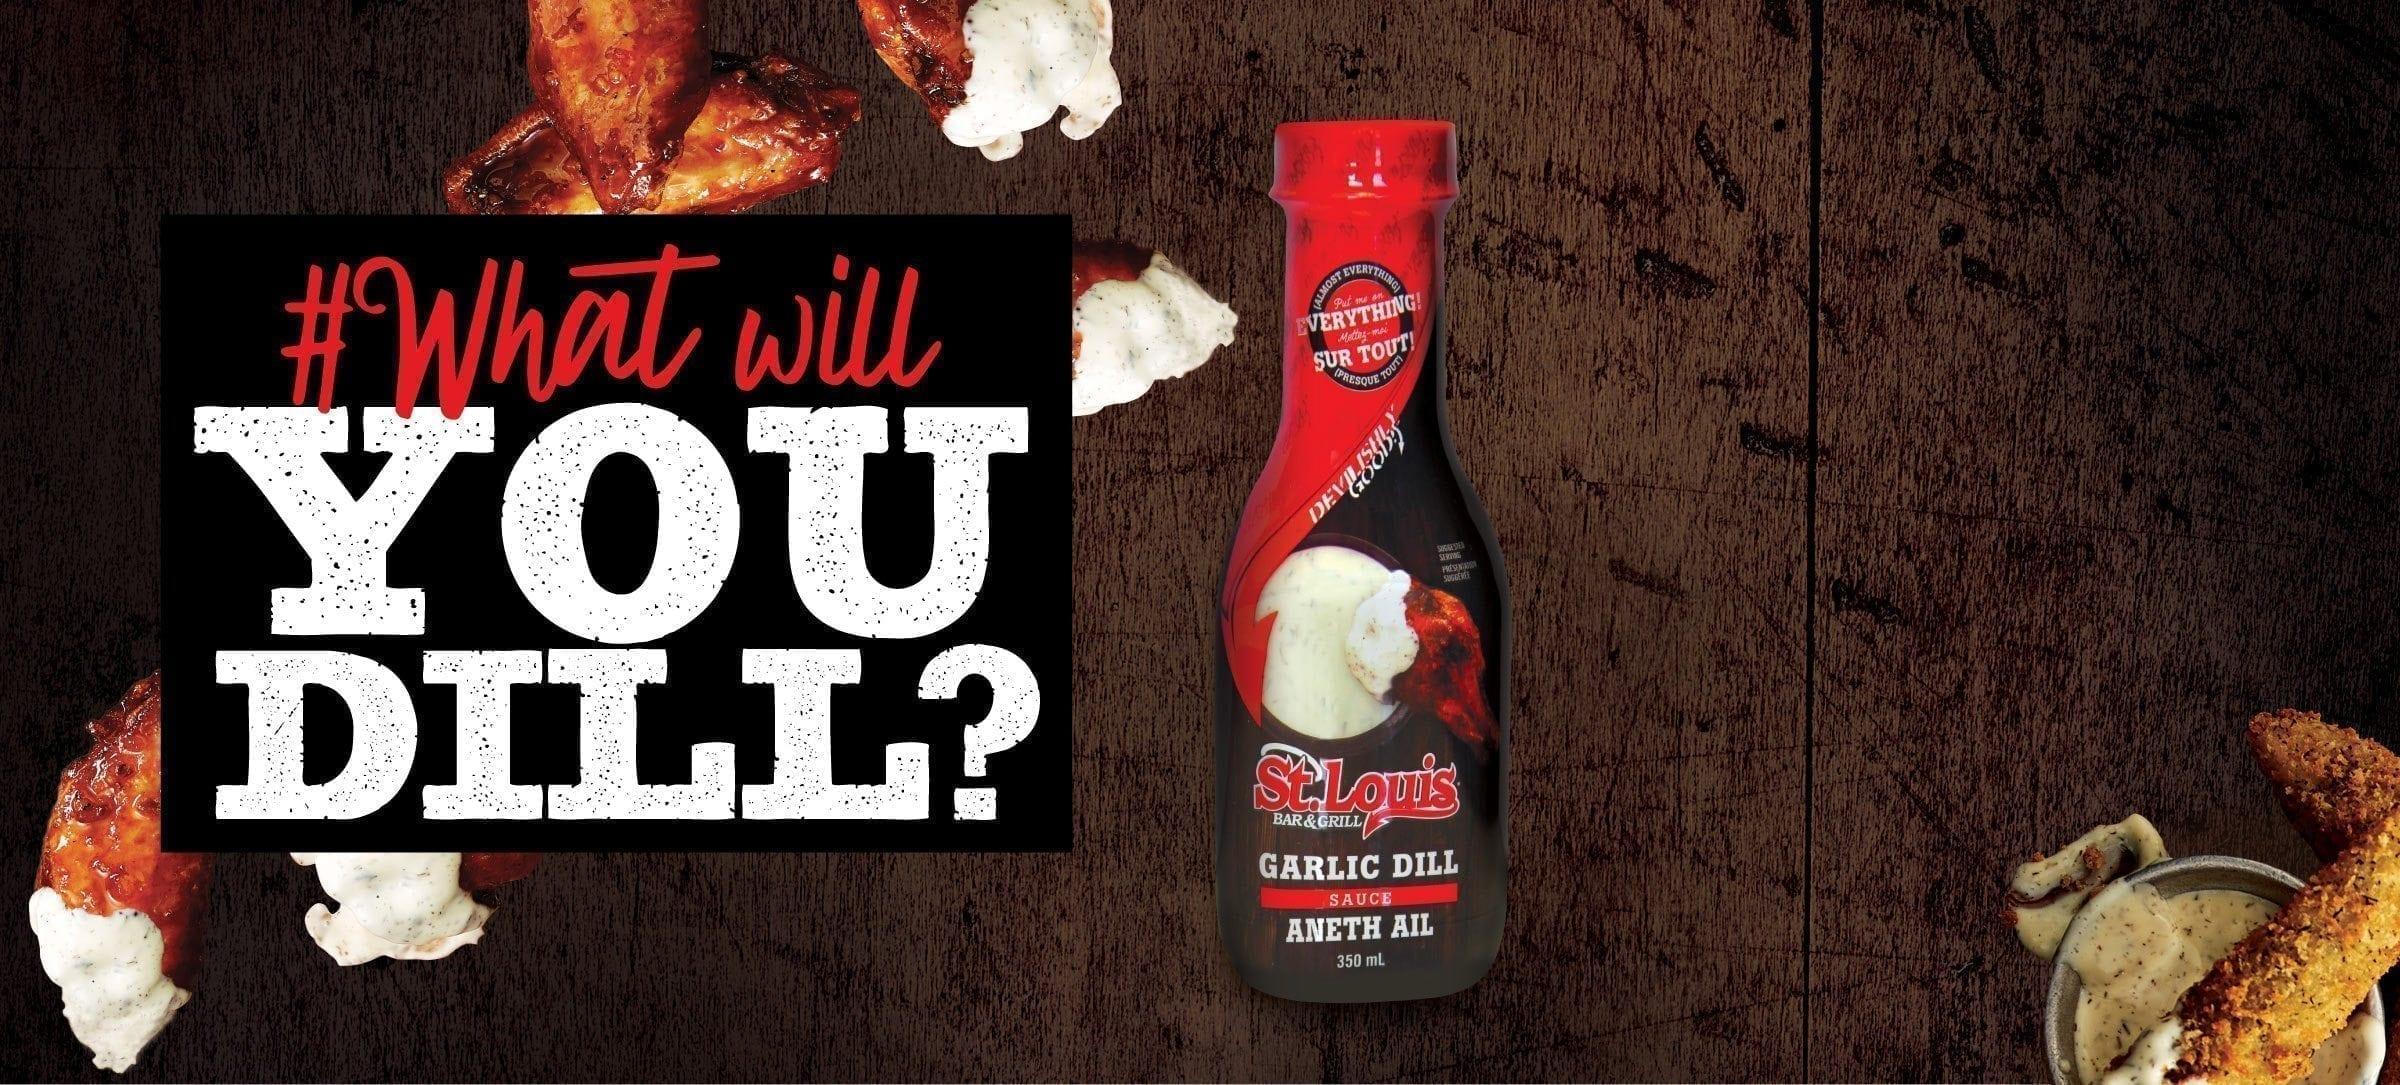 New Garlic Sauce Take-Home Bottle